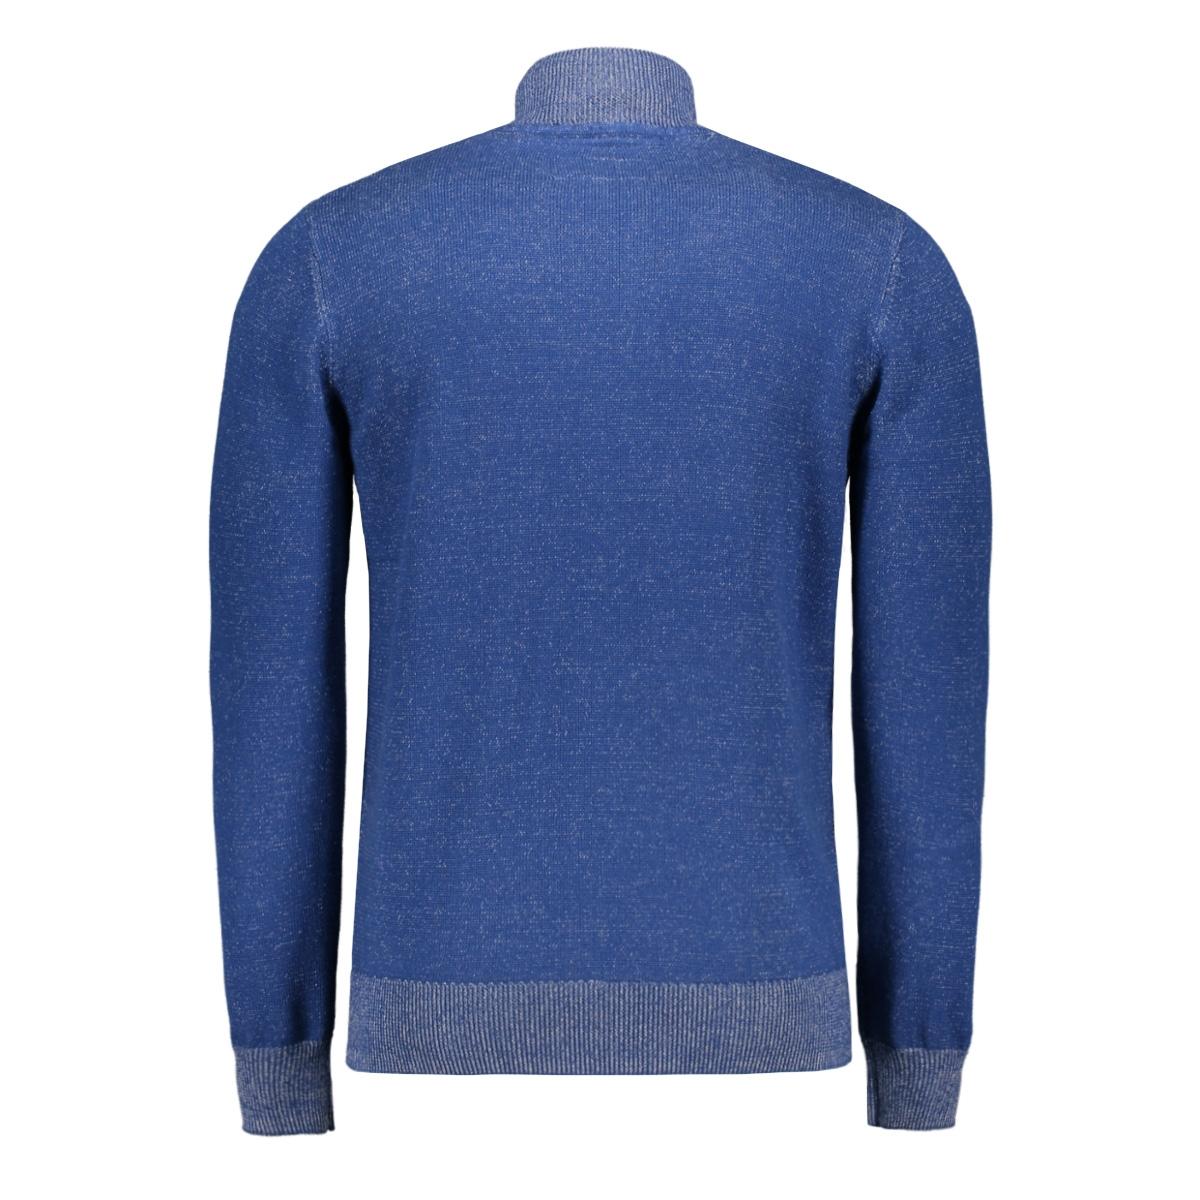 gemeleerde trui met rits 1015191xx10 tom tailor trui 16340